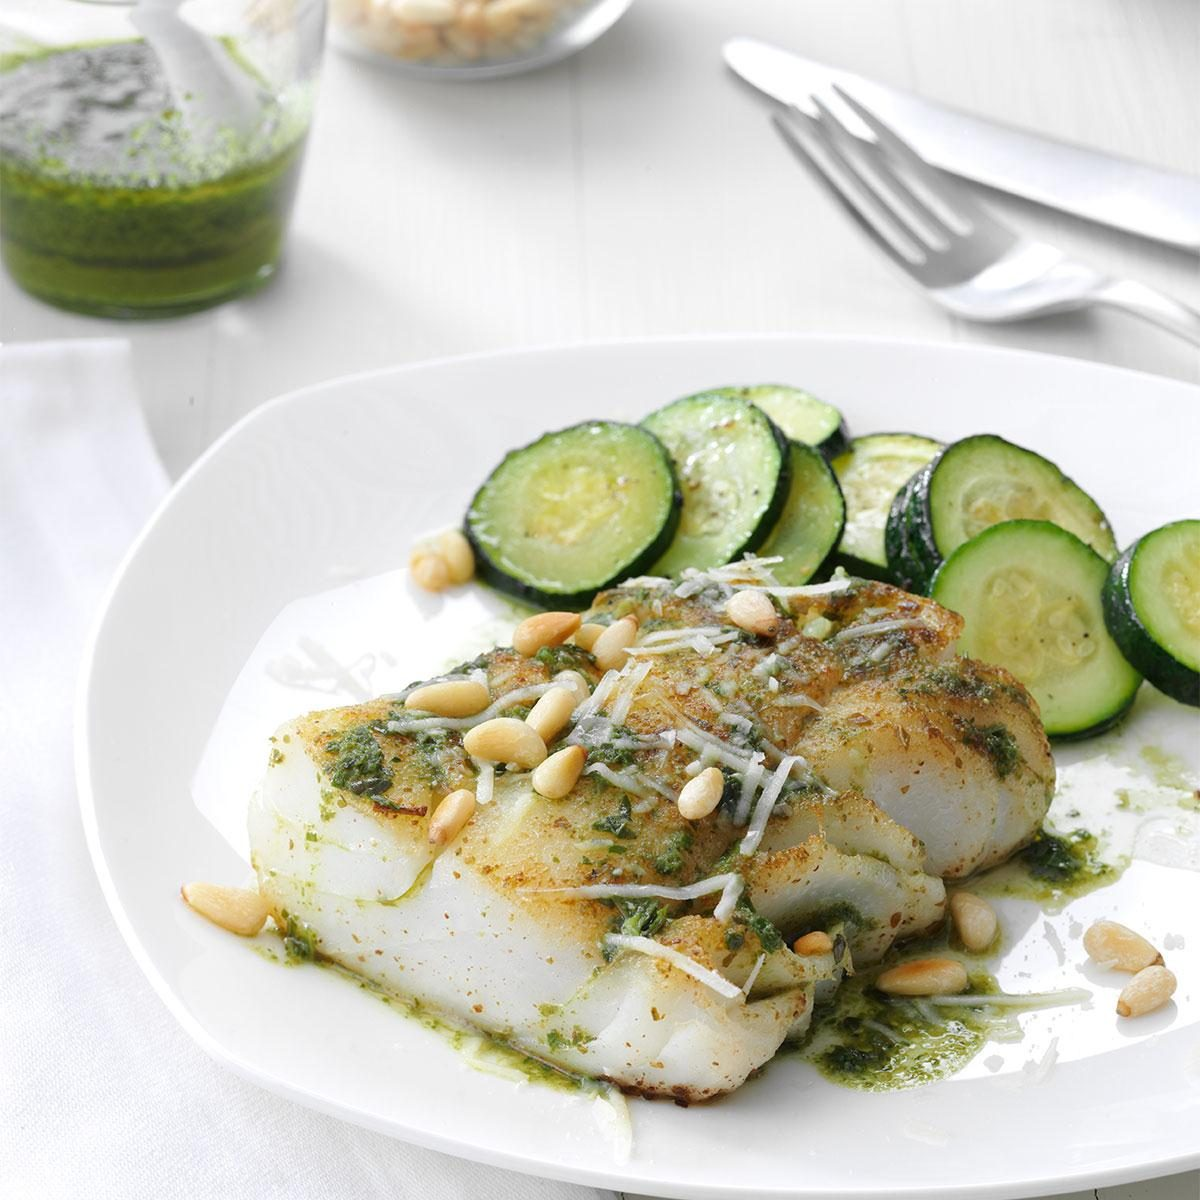 Pesto fish with pine nuts recipe taste of home for Pesto fish recipes